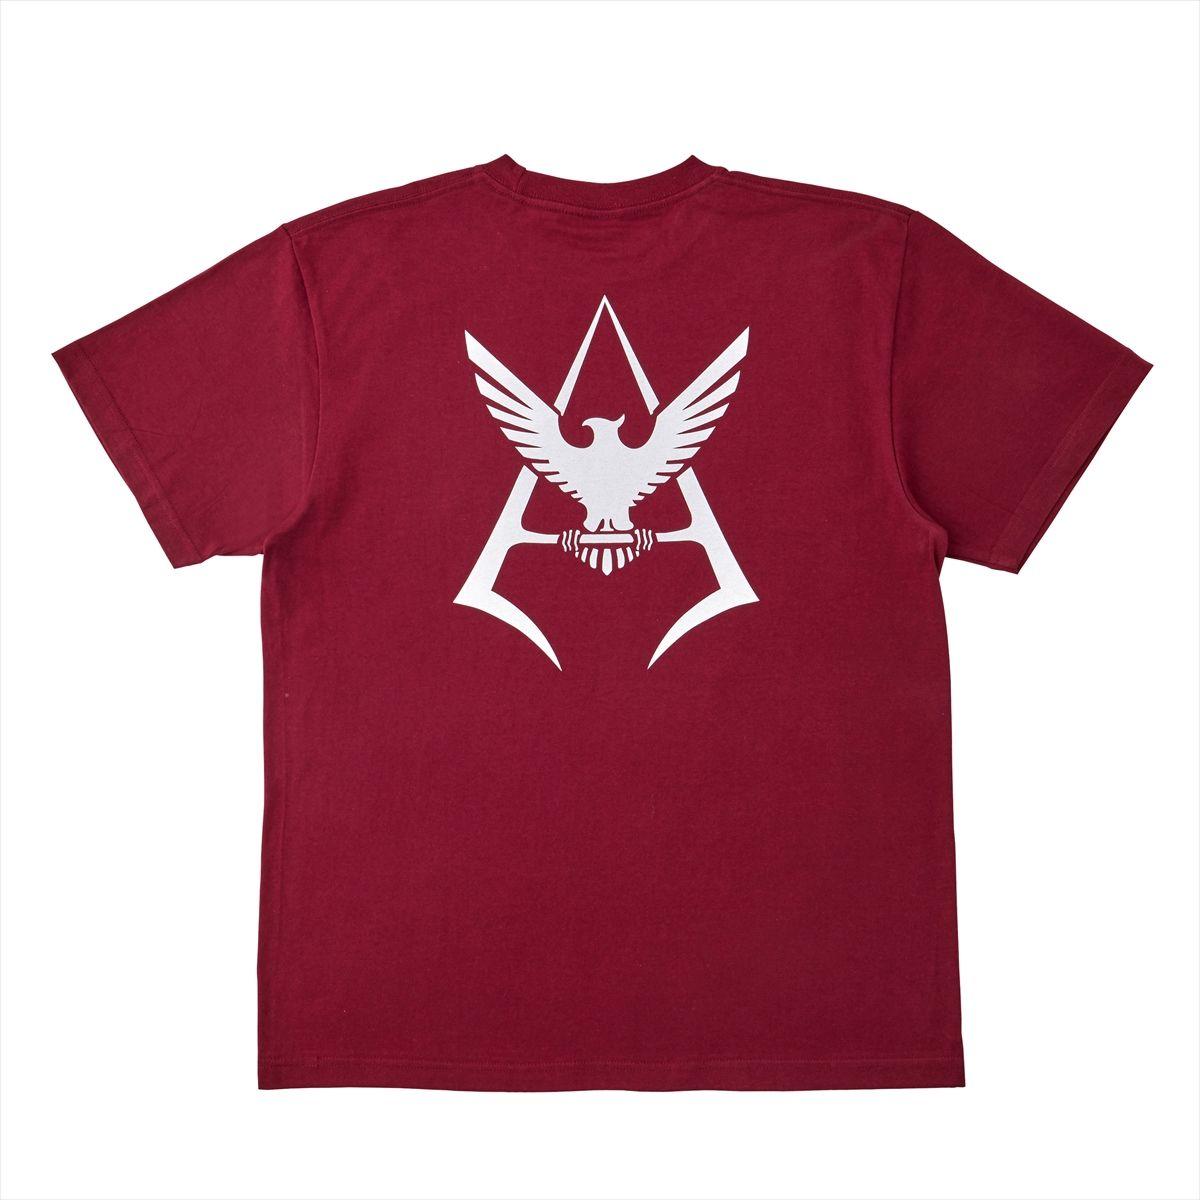 Mobile Suit Gundam Char Aznable Logo T-shirt